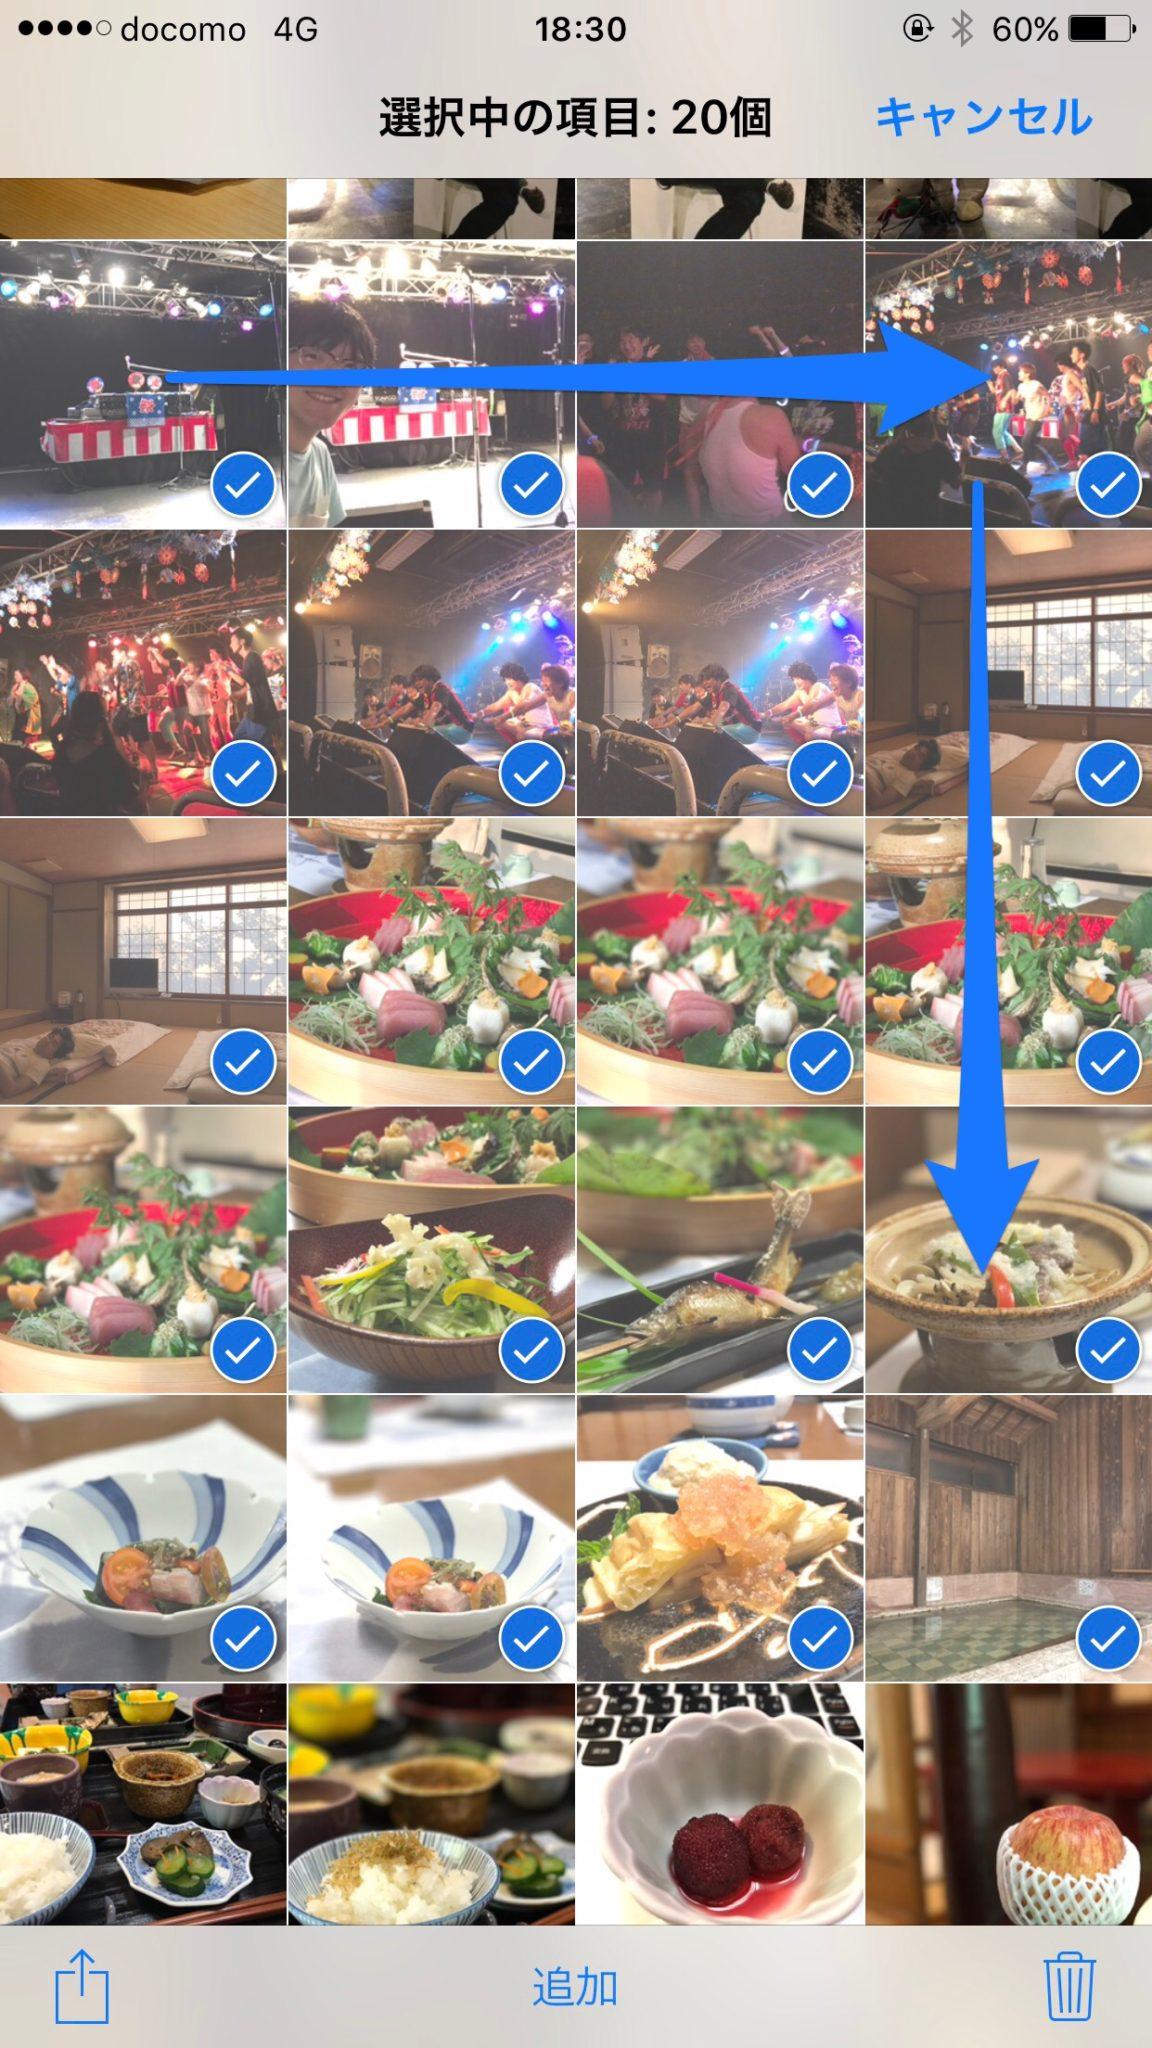 【iPhone便利機能】iPhoneの写真をすばやく複数選択する方法